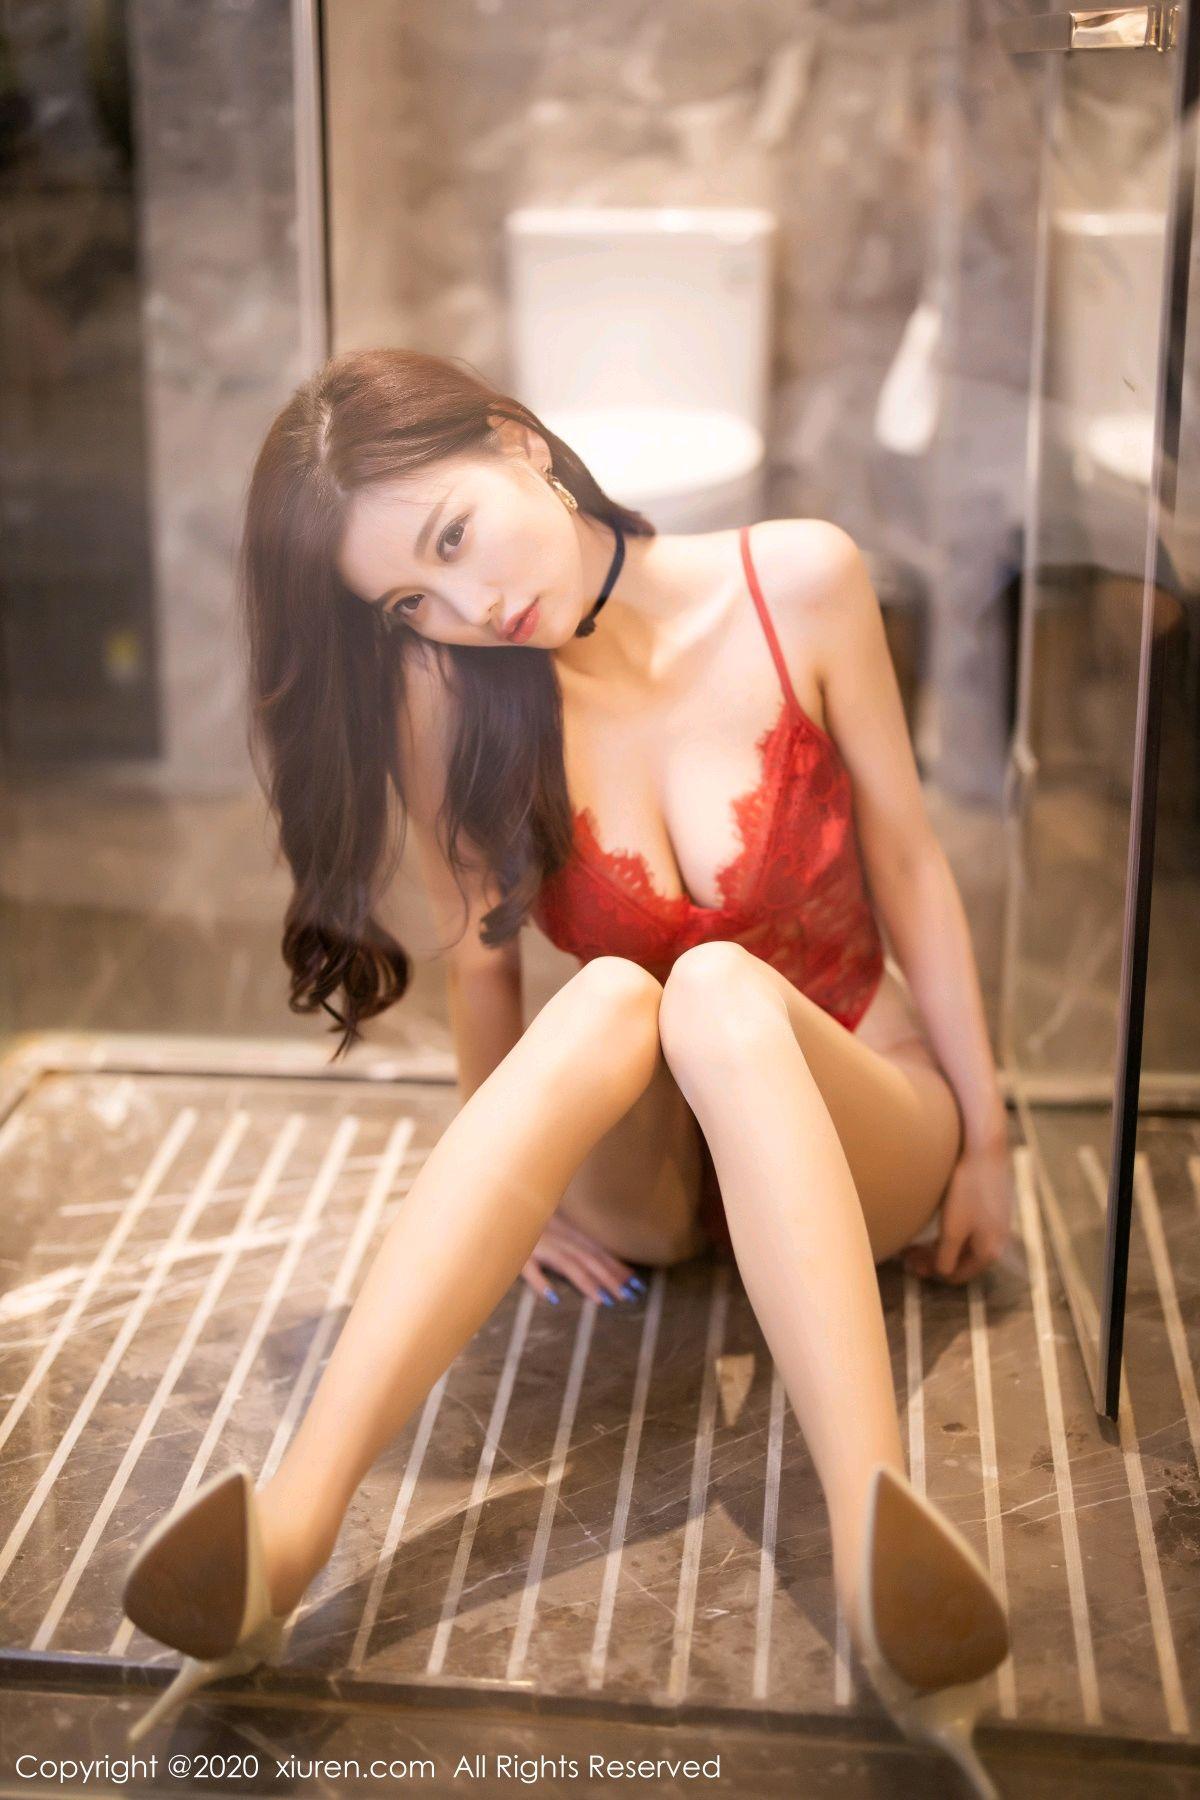 [XiuRen] Vol.2671 Yang Chen Chen 54P, Underwear, Xiuren, Yang Chen Chen